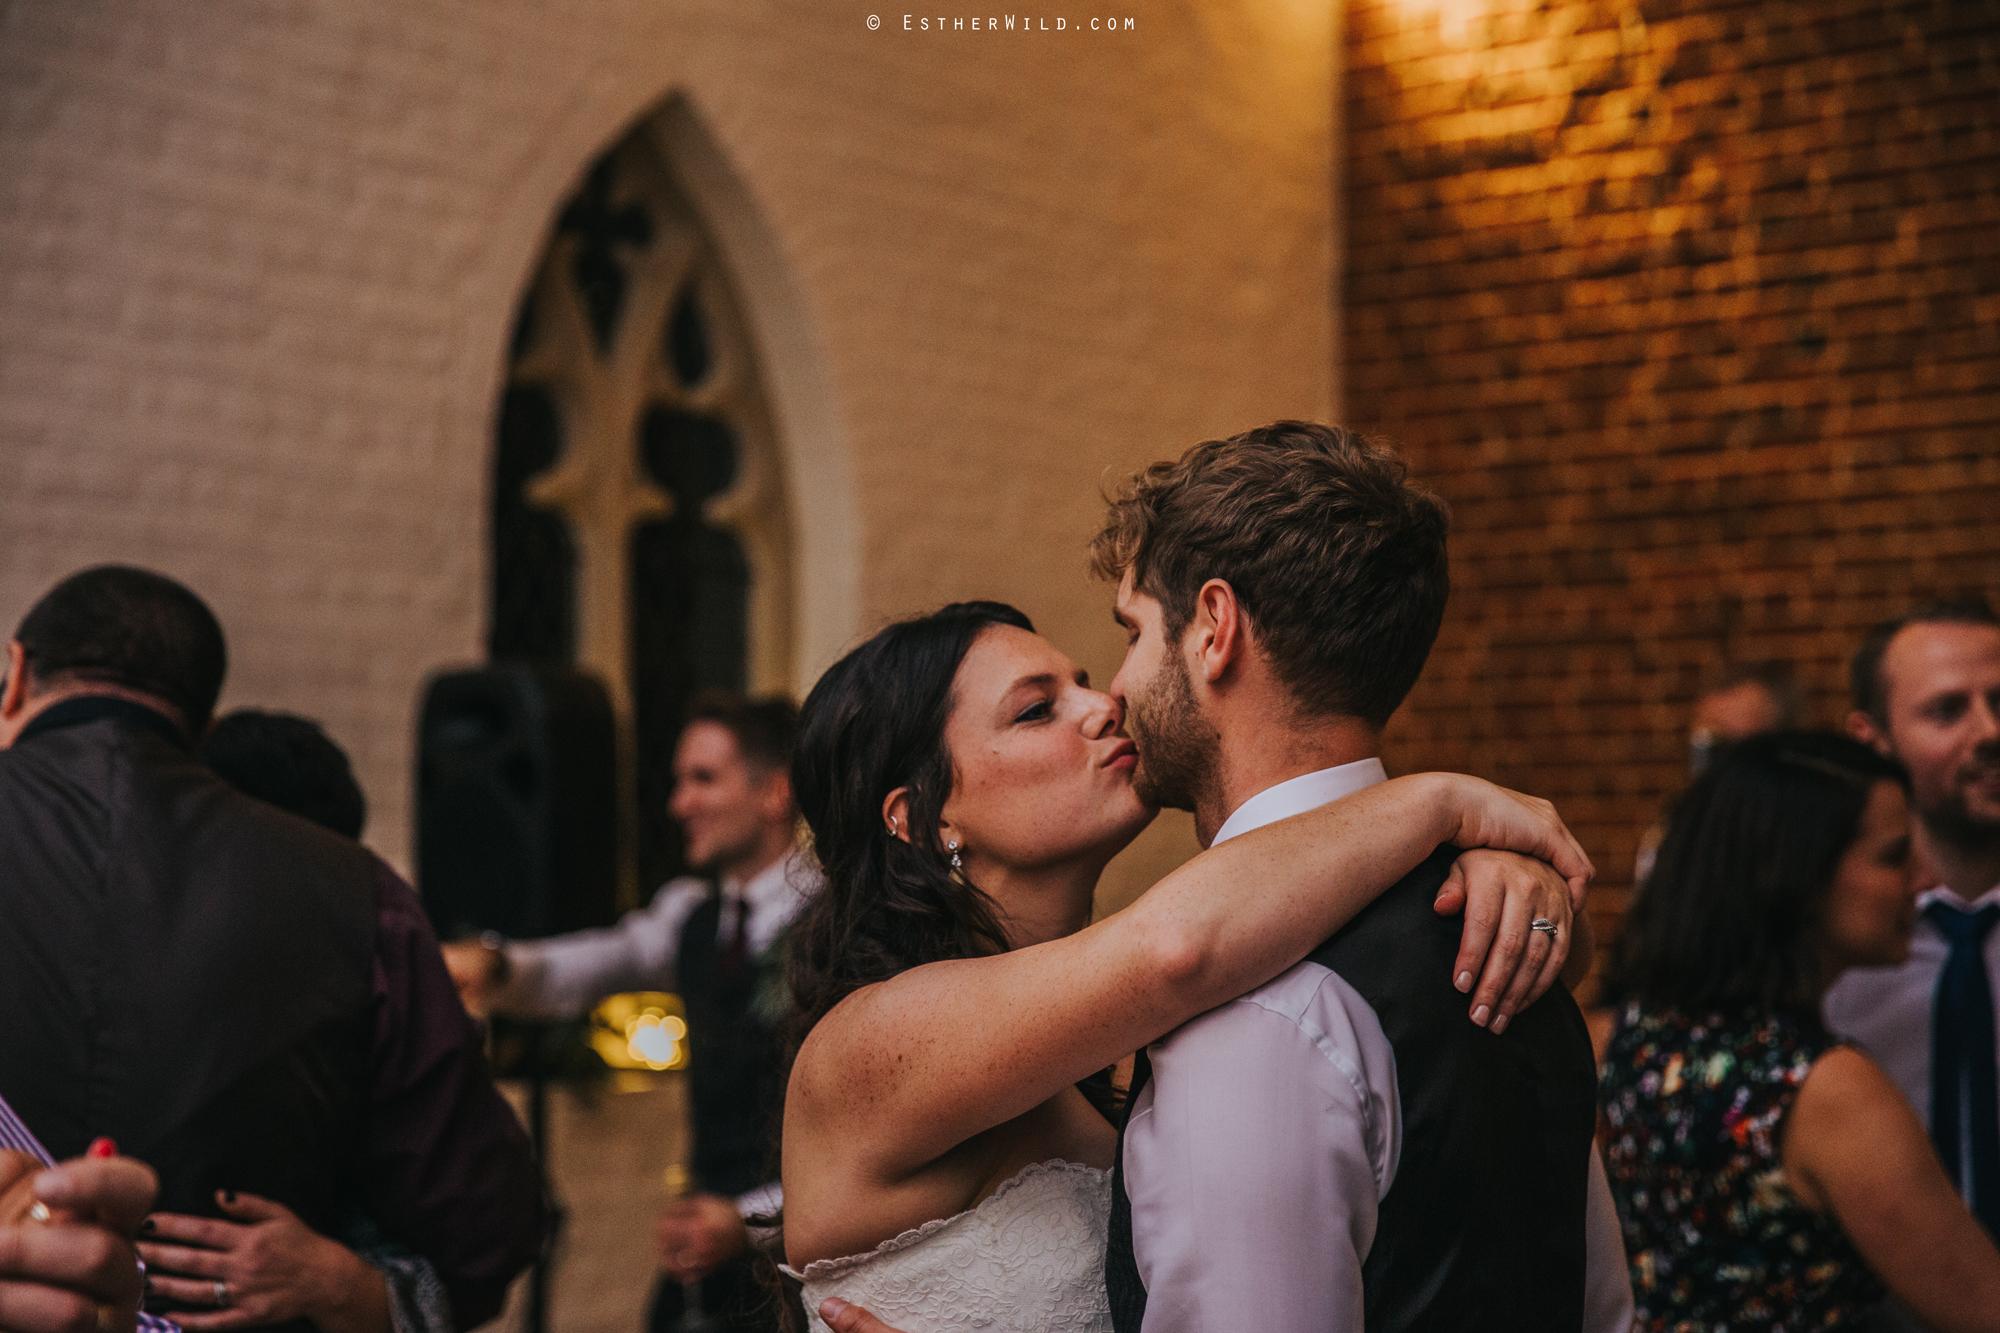 Reading_Room_Weddings_Alby_Norwich_Photographer_Esther_Wild_IMG_4060.jpg